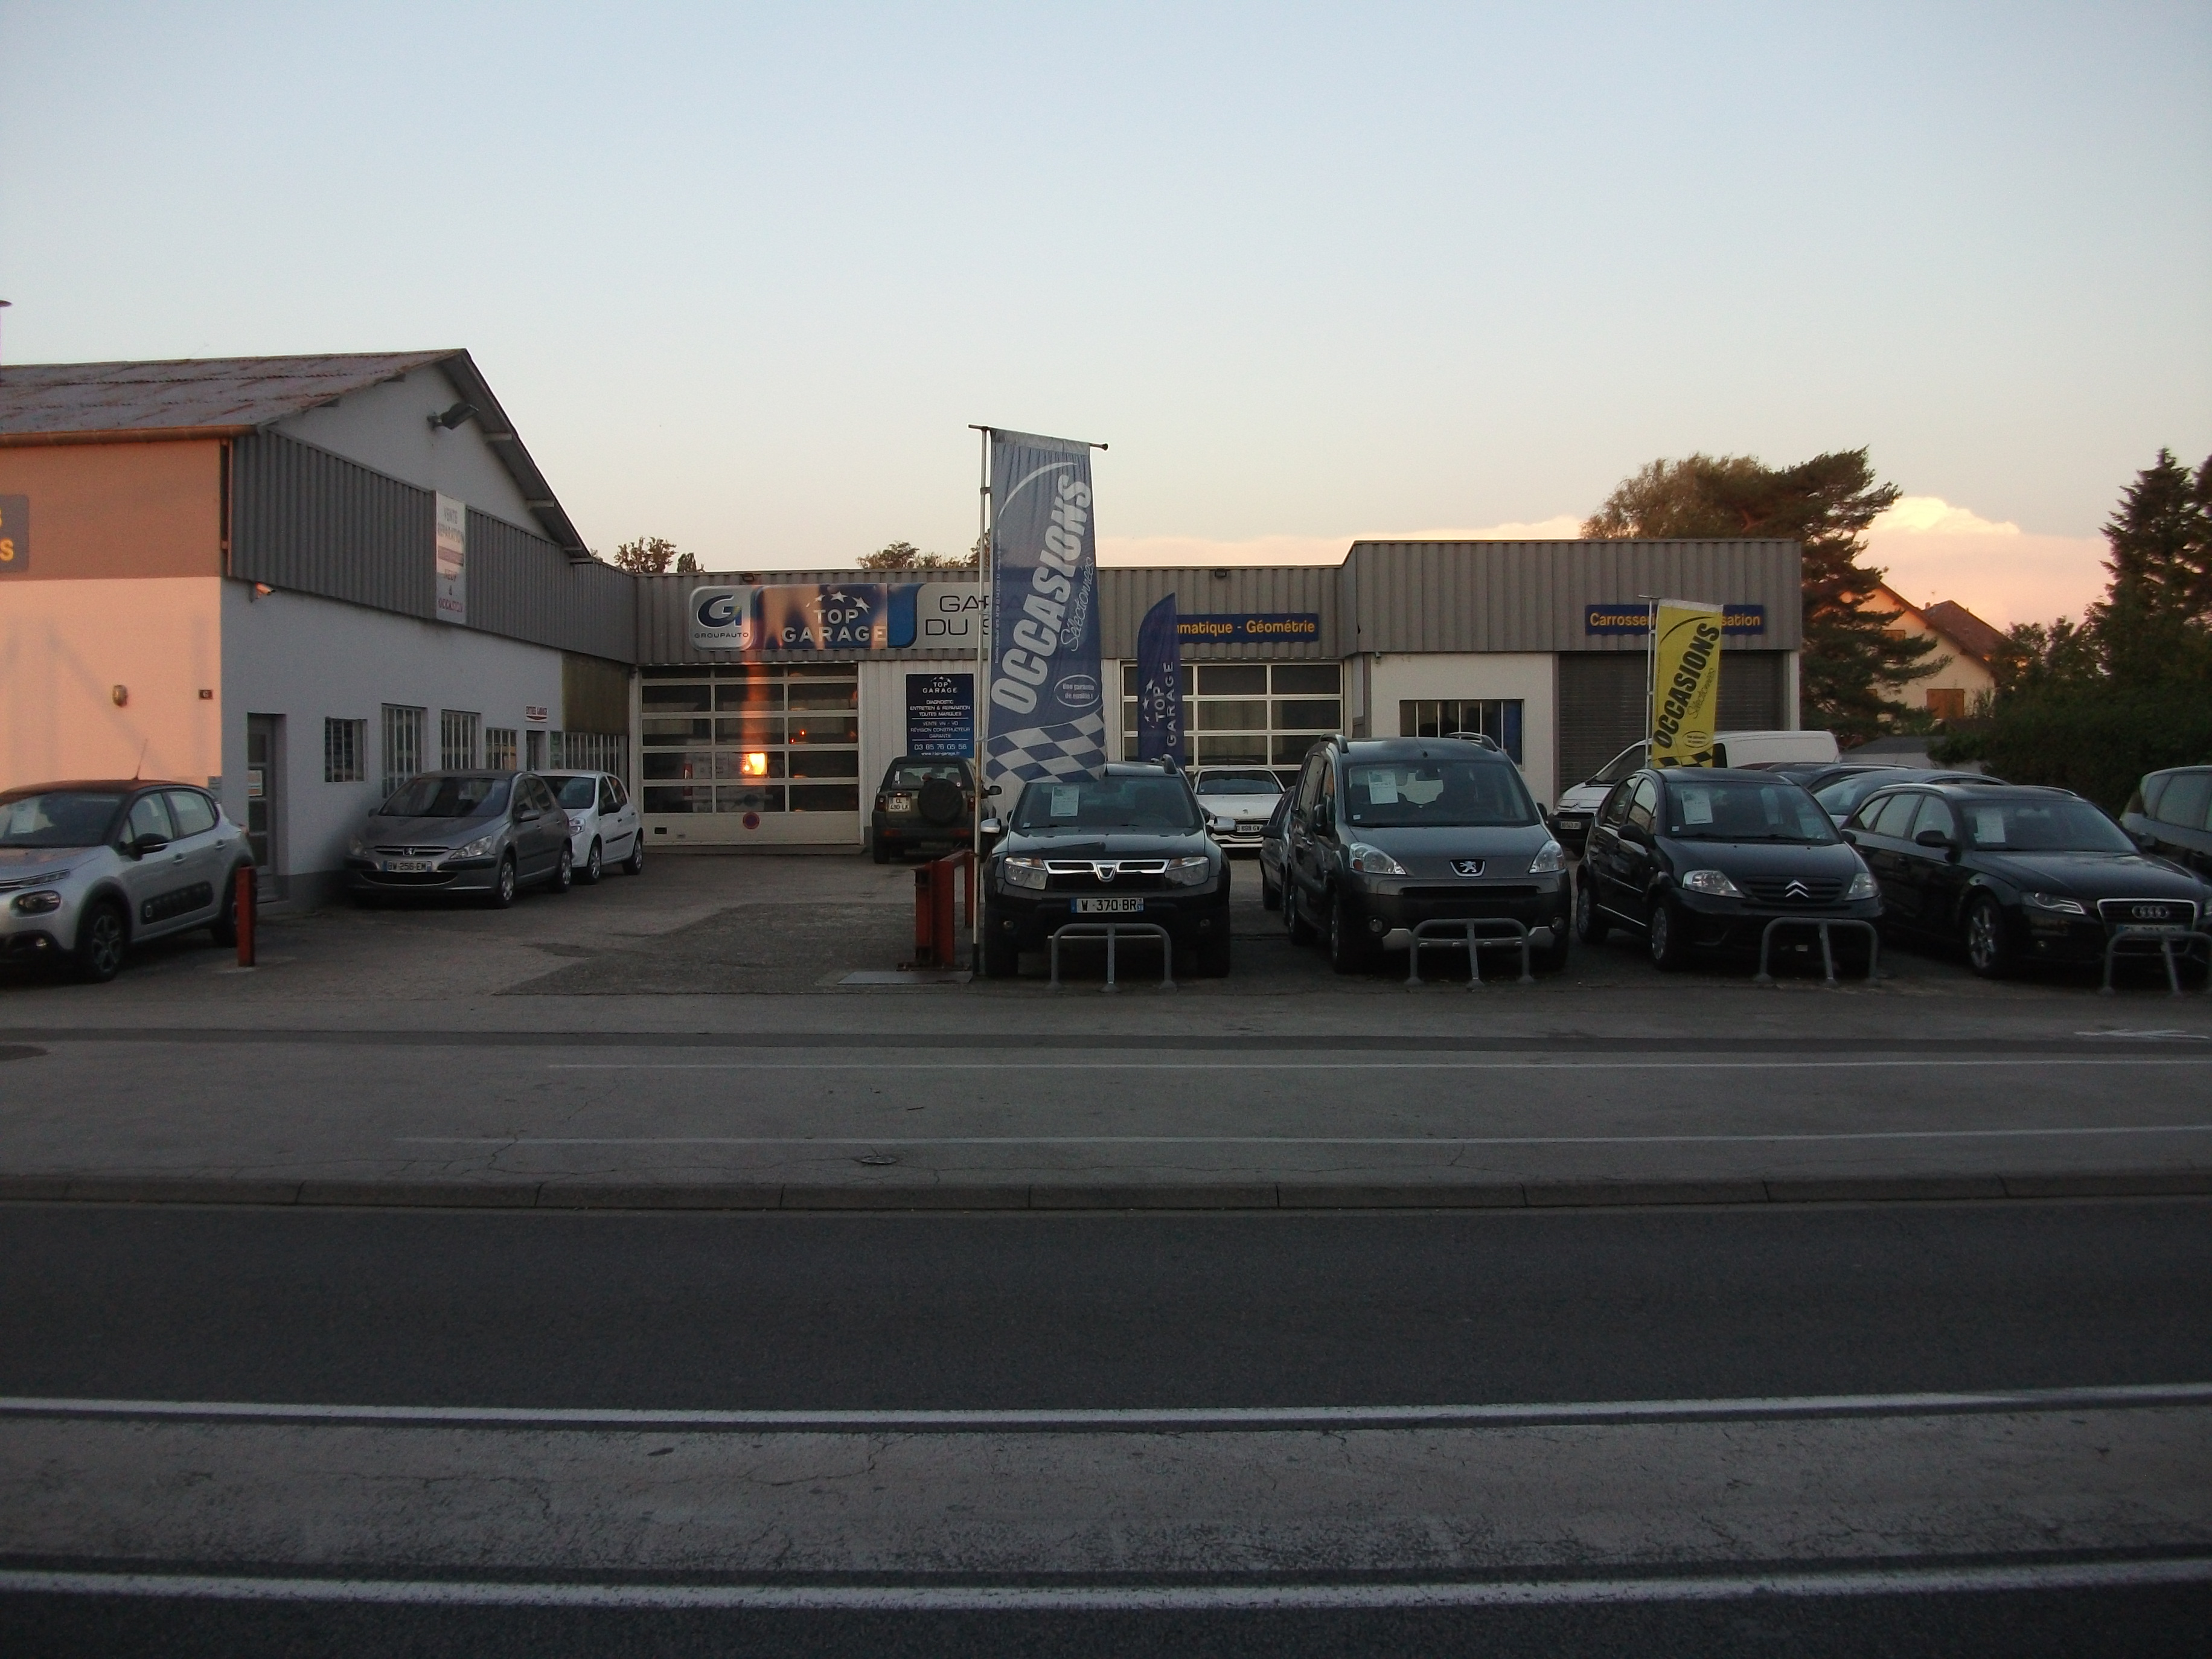 garage du stade perrin pascal voiture occasion louhans vente auto louhans. Black Bedroom Furniture Sets. Home Design Ideas